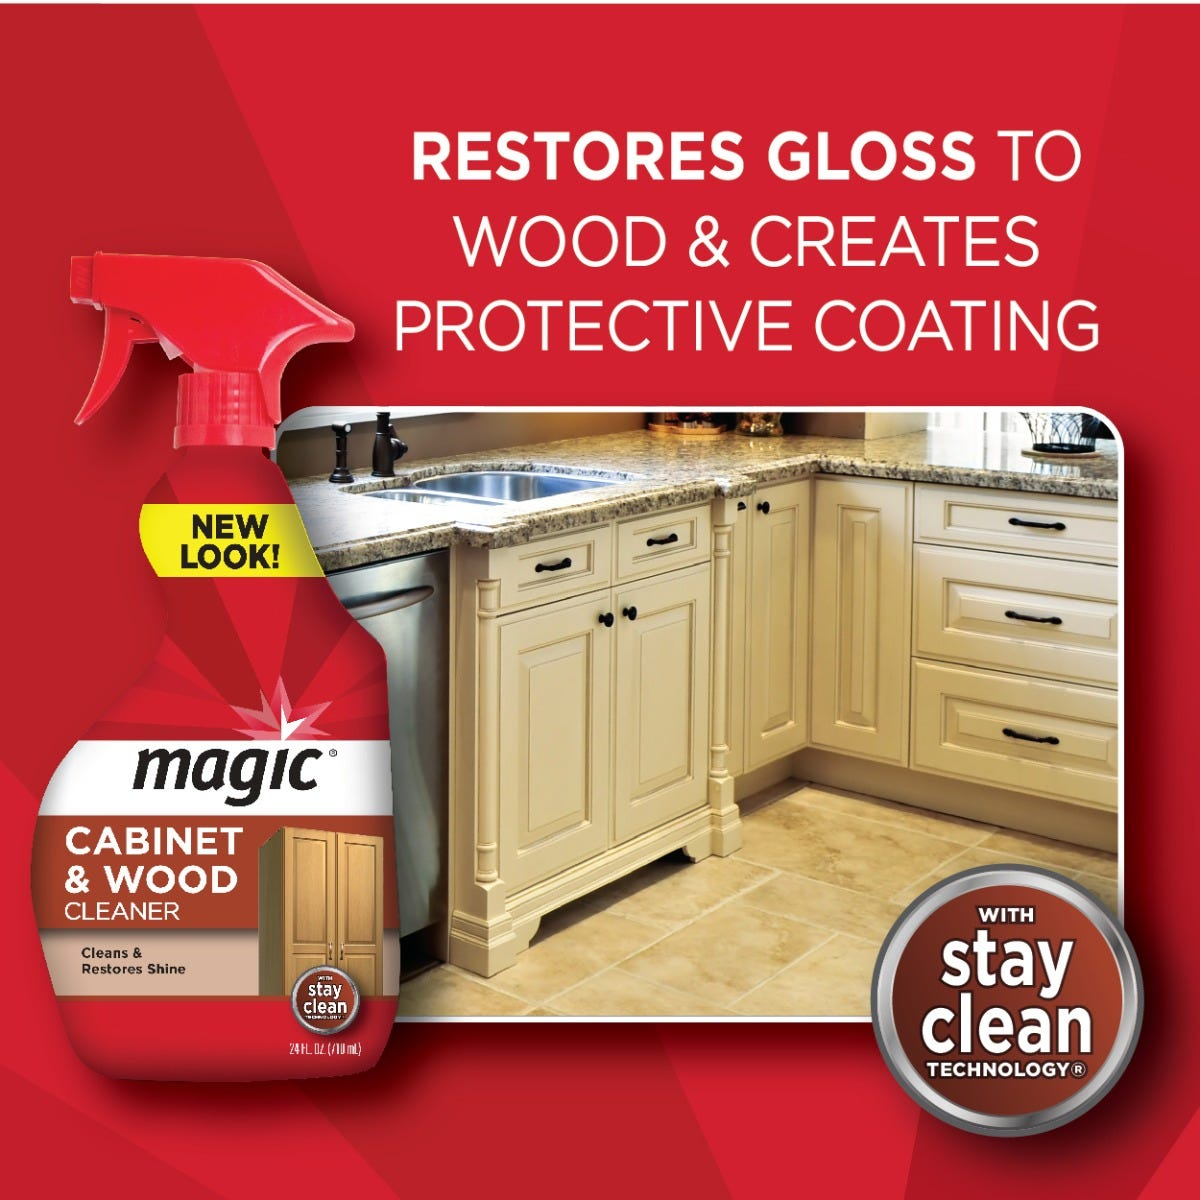 https://googone.com/media/catalog/product/m/a/magic_cabinet_cleaner_spray_beauty.jpg